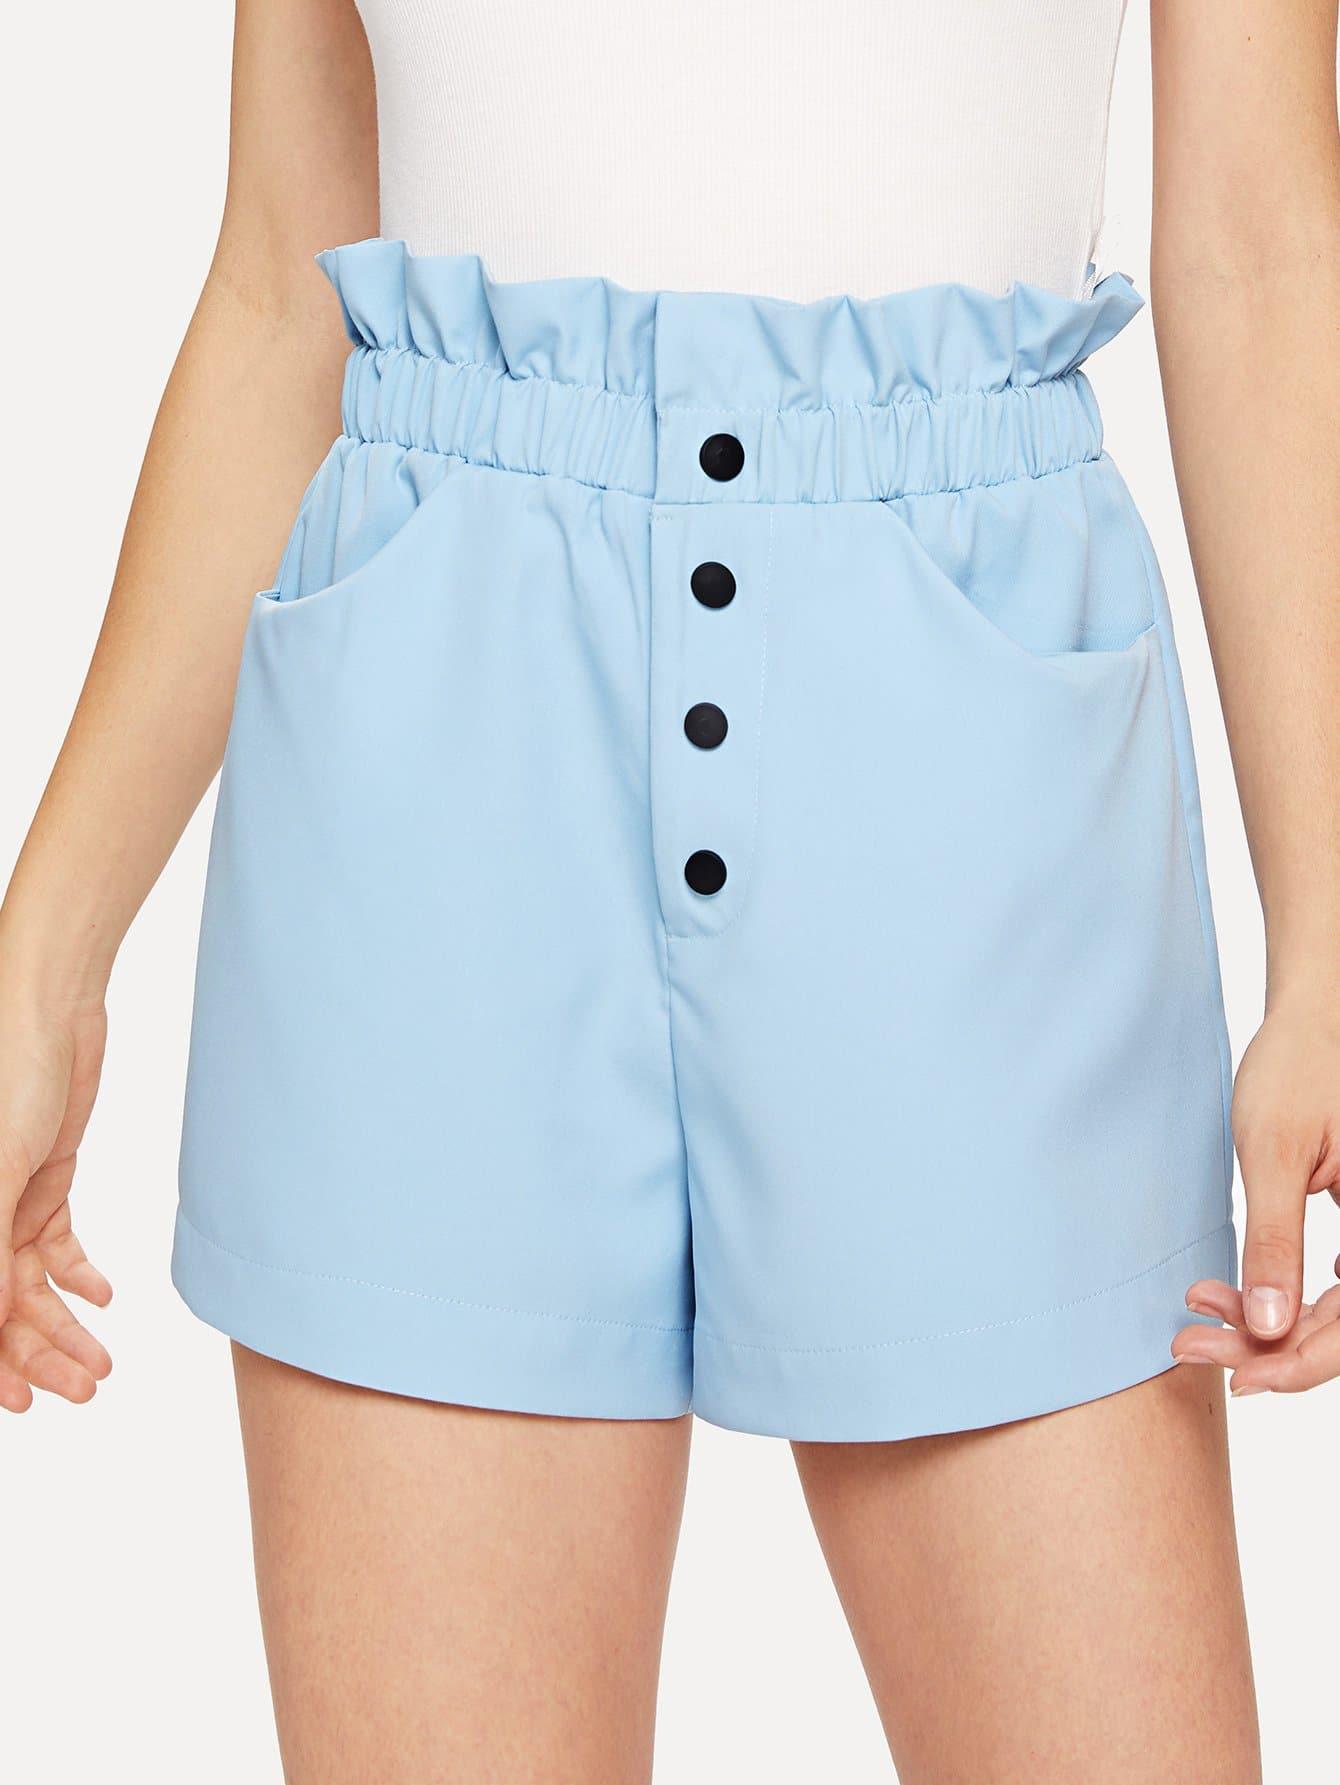 Pocket Patched Frill Waist Button Shorts high waist pocket patched dot skirt